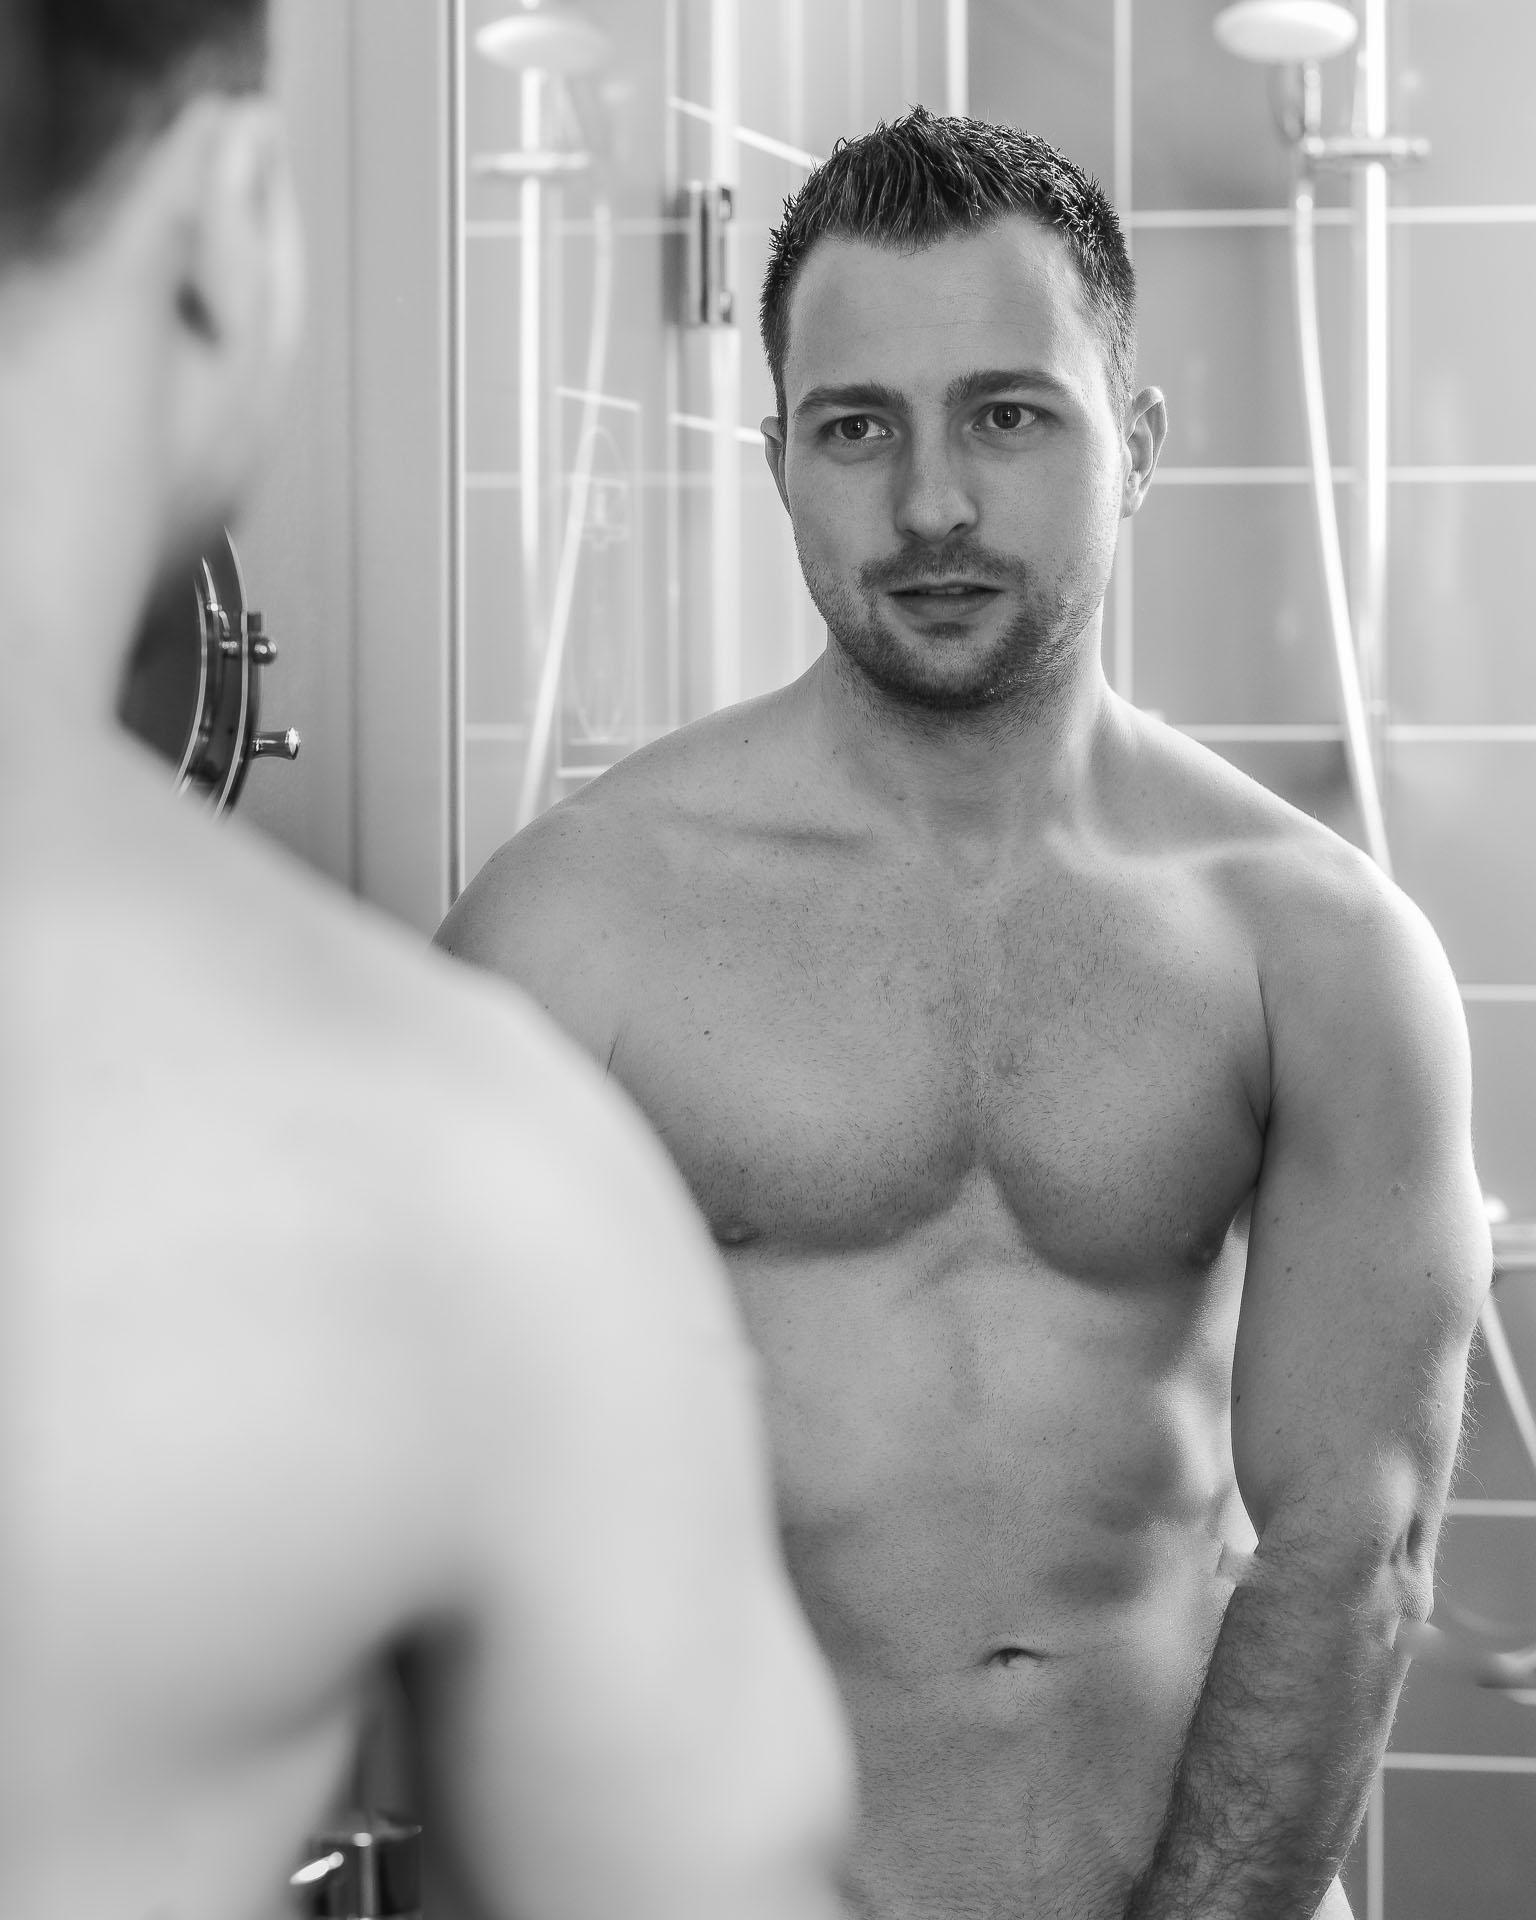 Männerfotografie, Aktshooting, Fotograf in Berlin für Männer